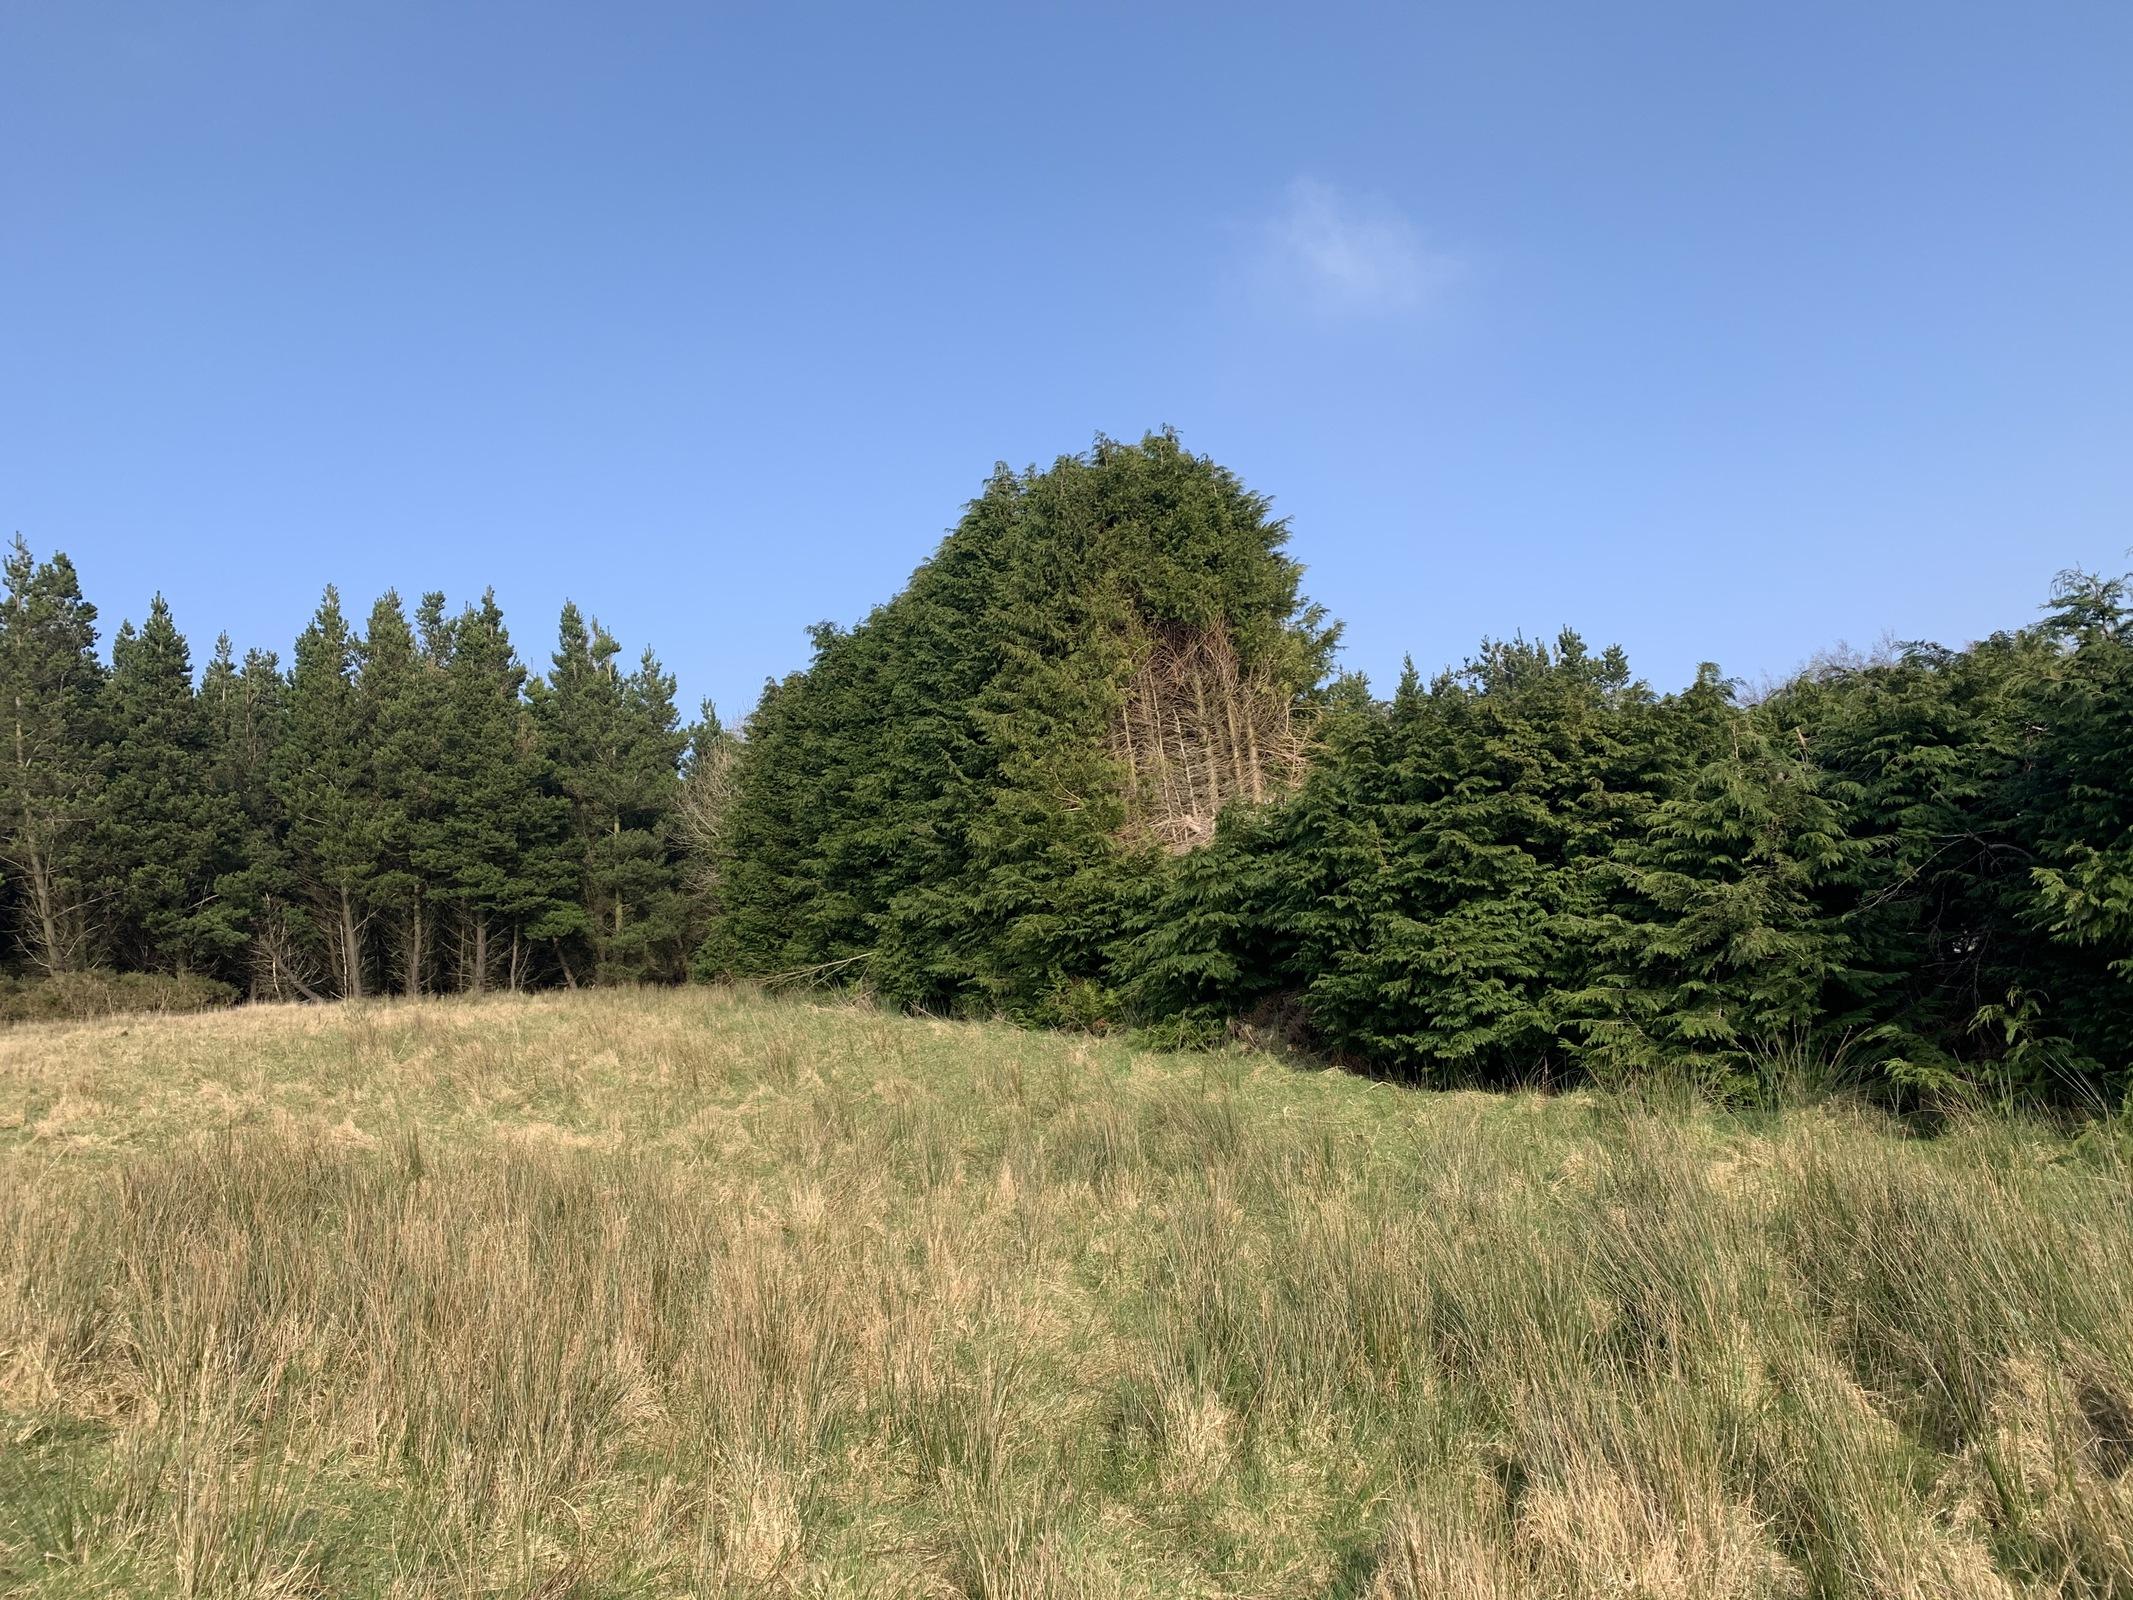 Land c. 1.1 Acres, Gap Road, Lacken, Co. Wicklow